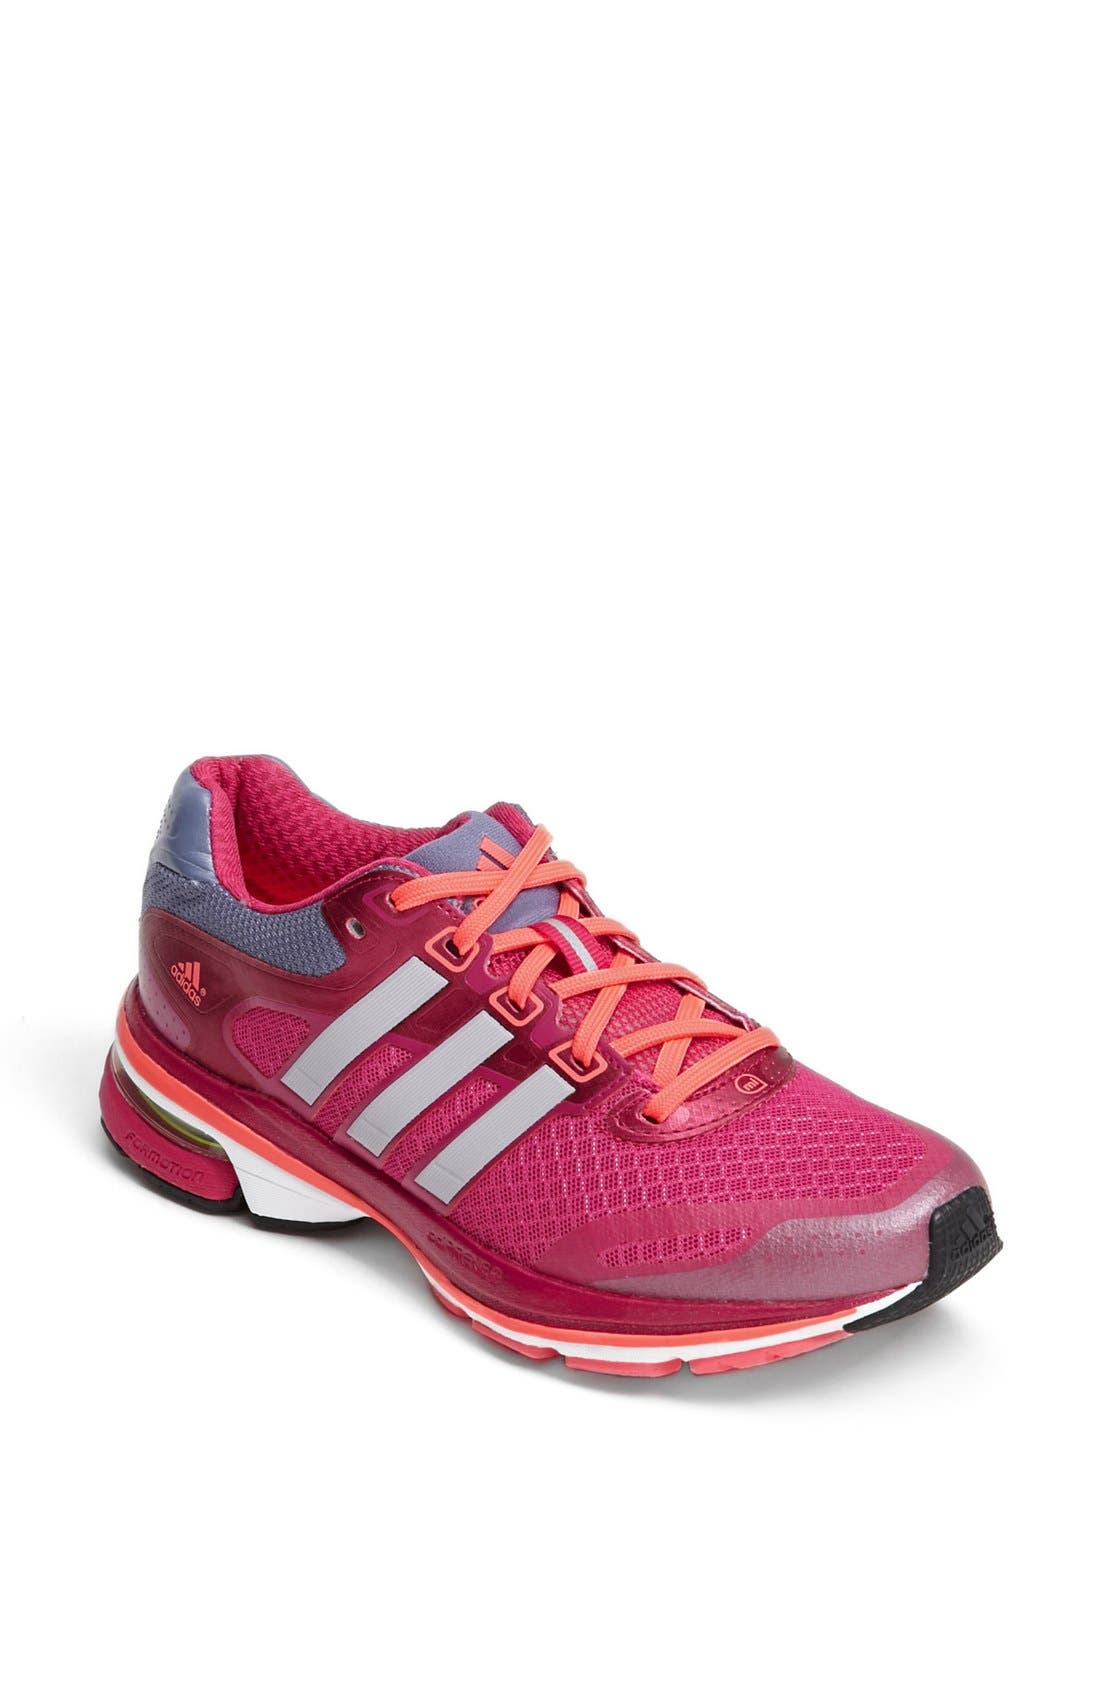 Main Image - adidas 'Supernova Glide 5' Running Shoe (Women)